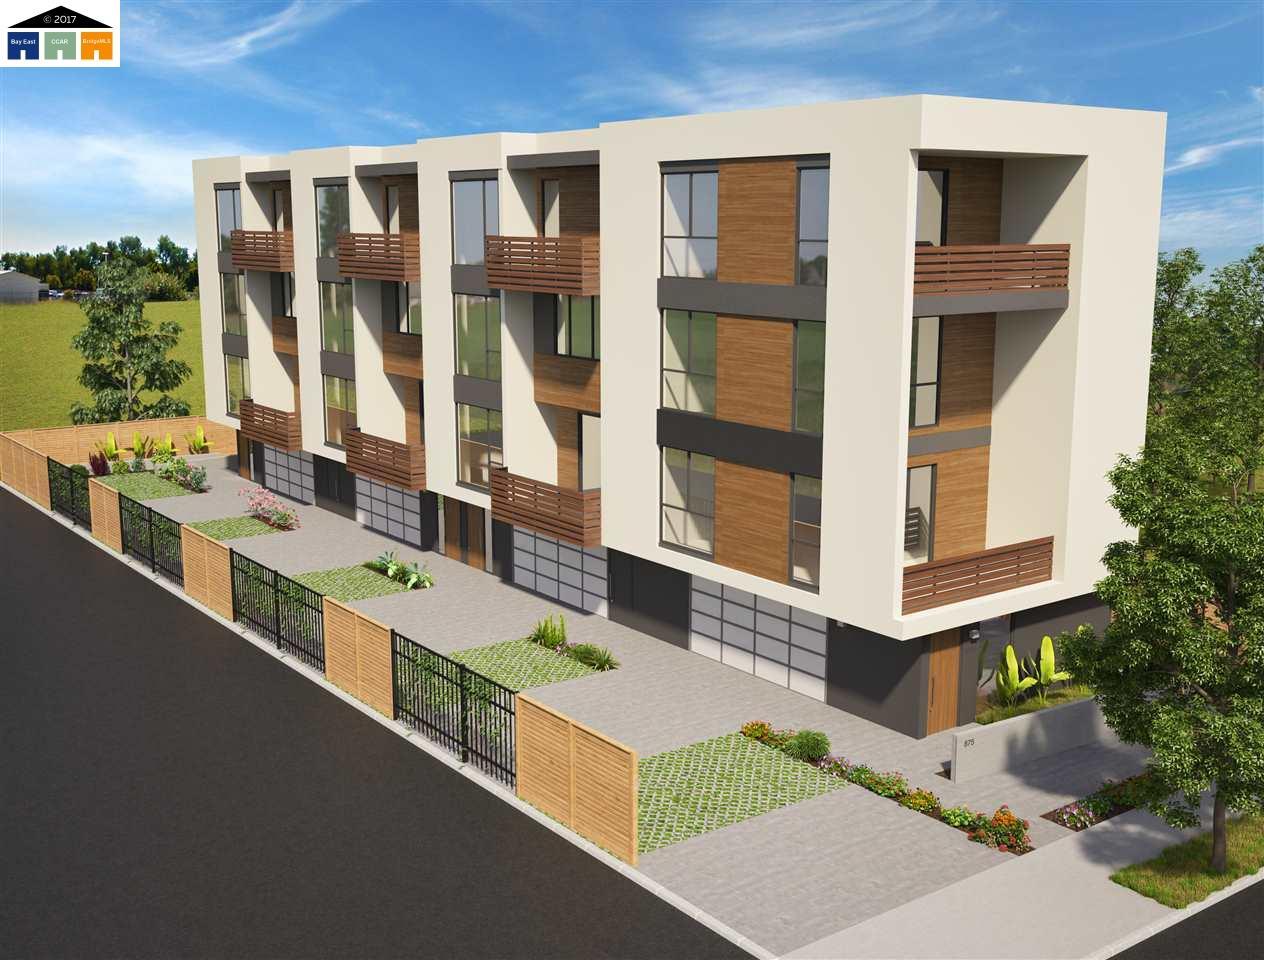 Land for Sale at 875 Alvarado Street 875 Alvarado Street San Leandro, California 94577 United States